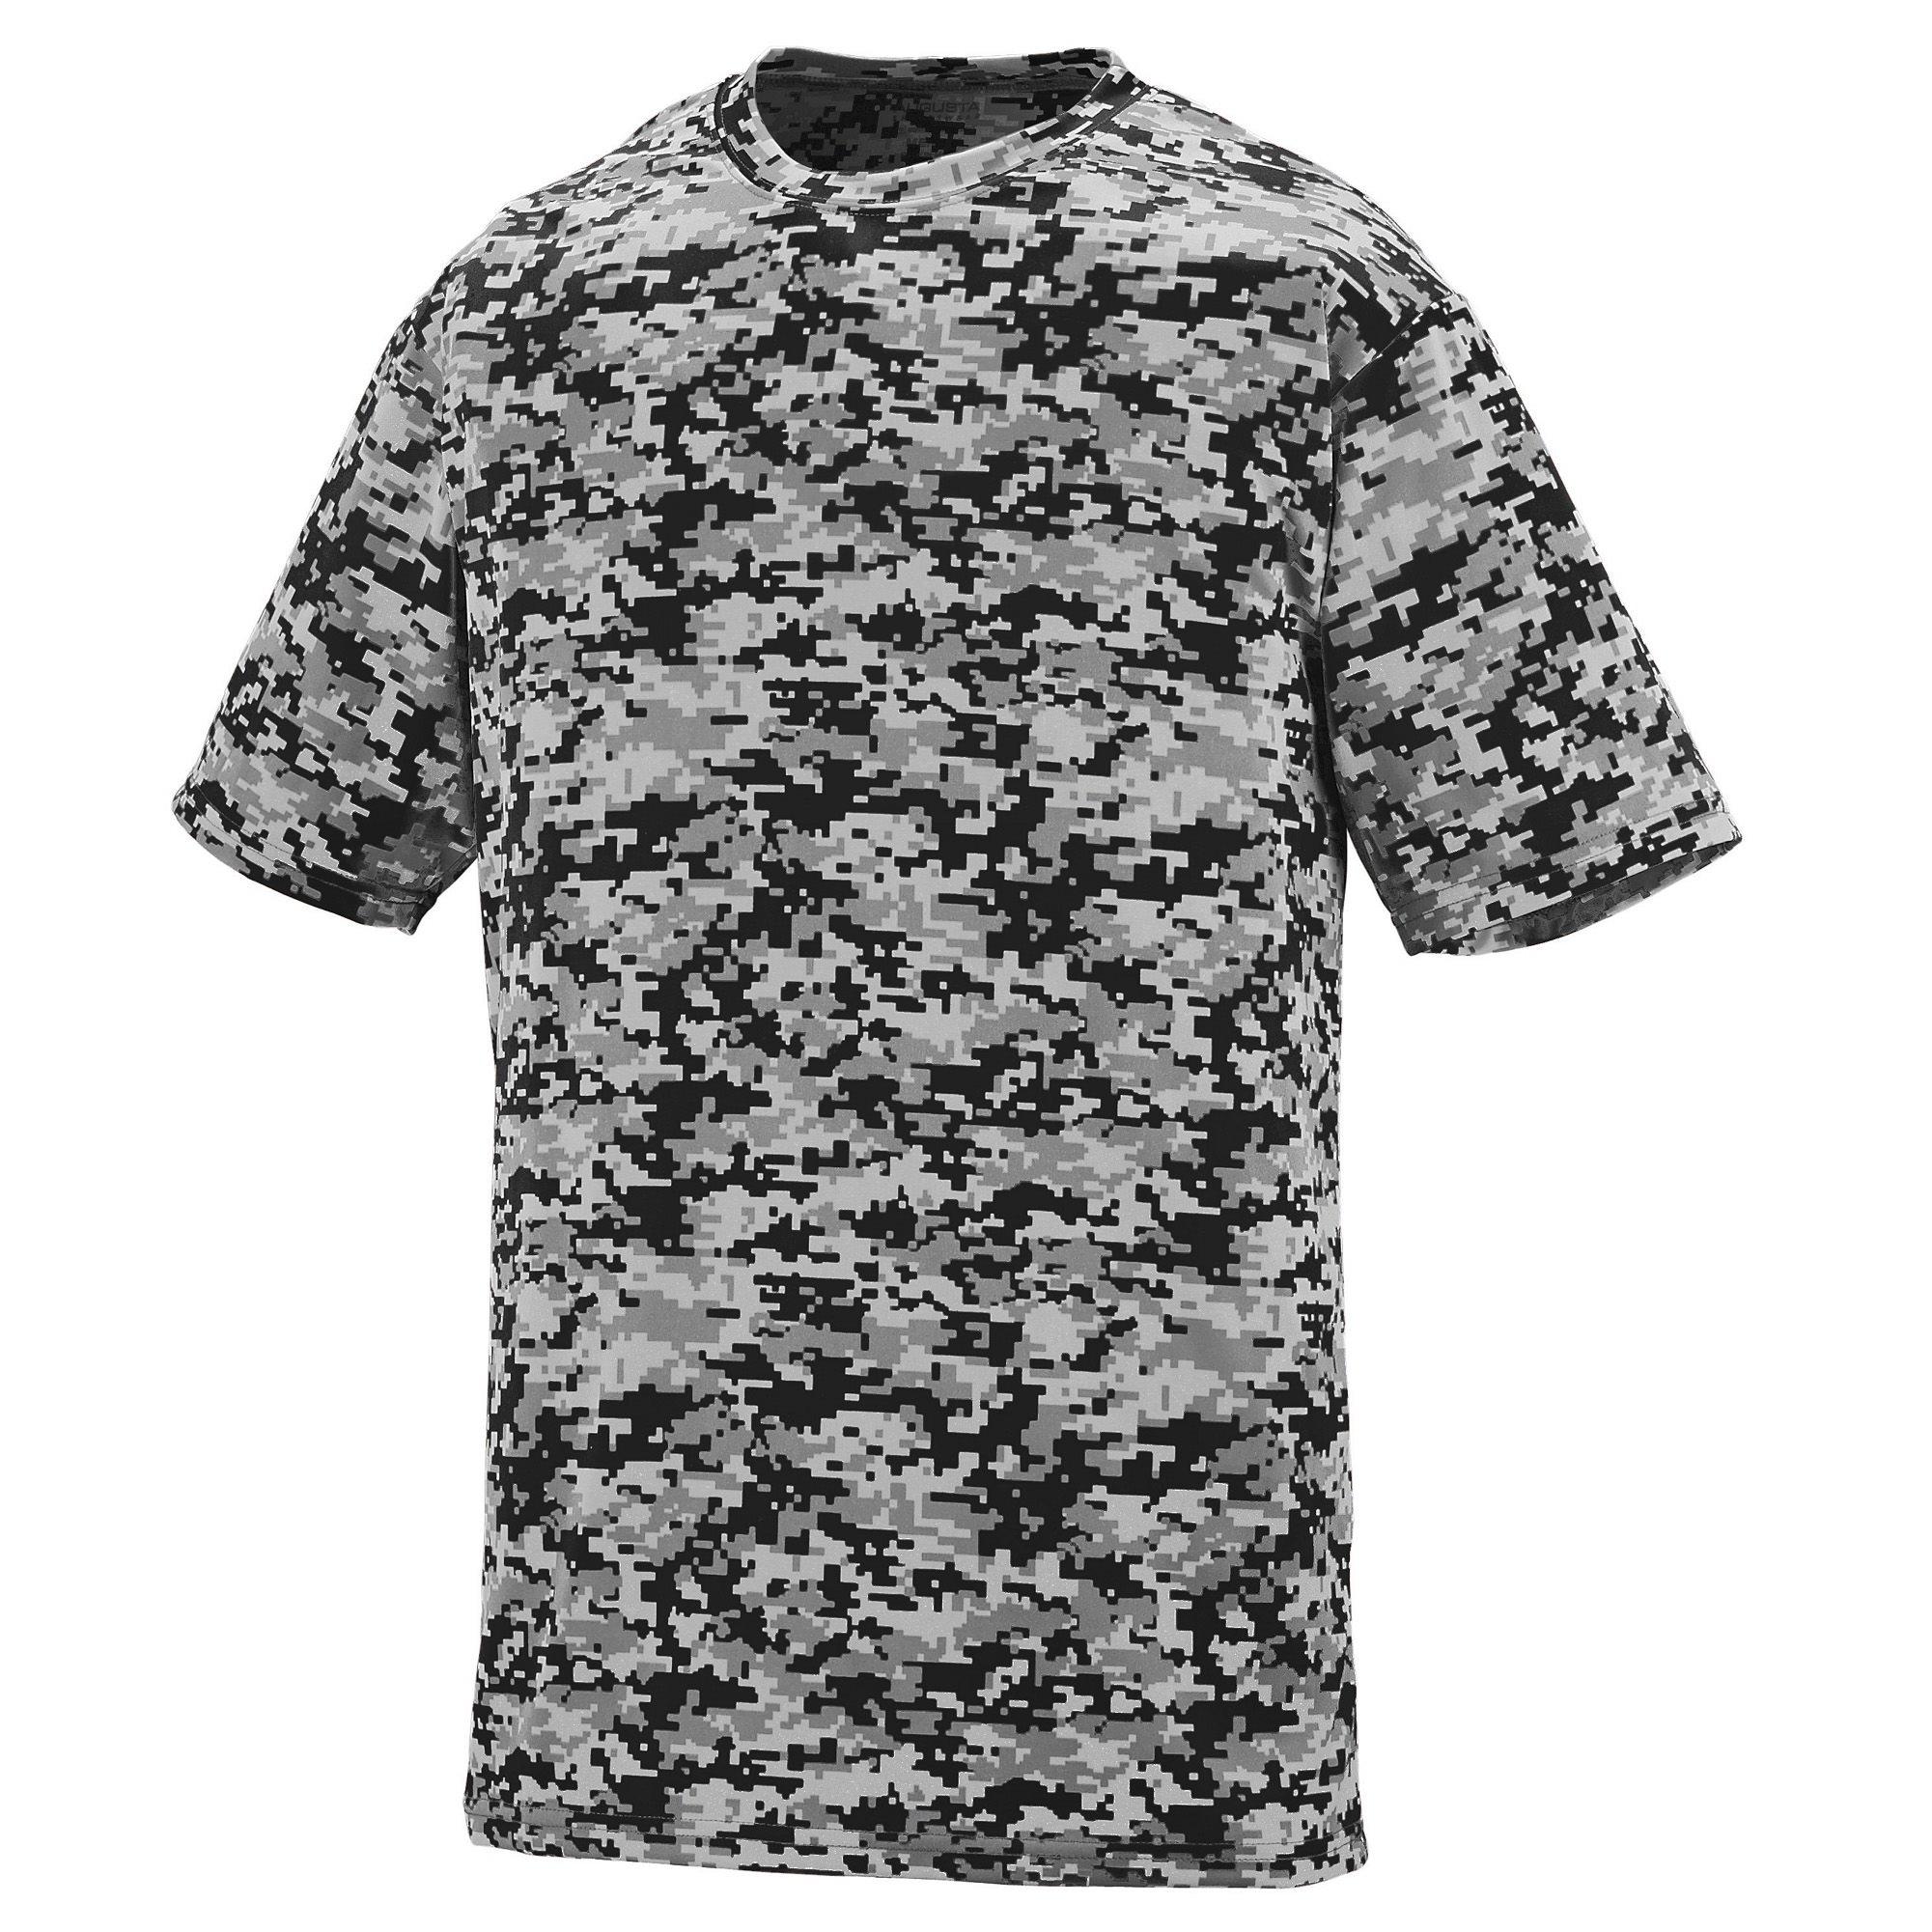 Augusta Sportswear Digi Camo Wicking T-Shirt, Large, Black Digi